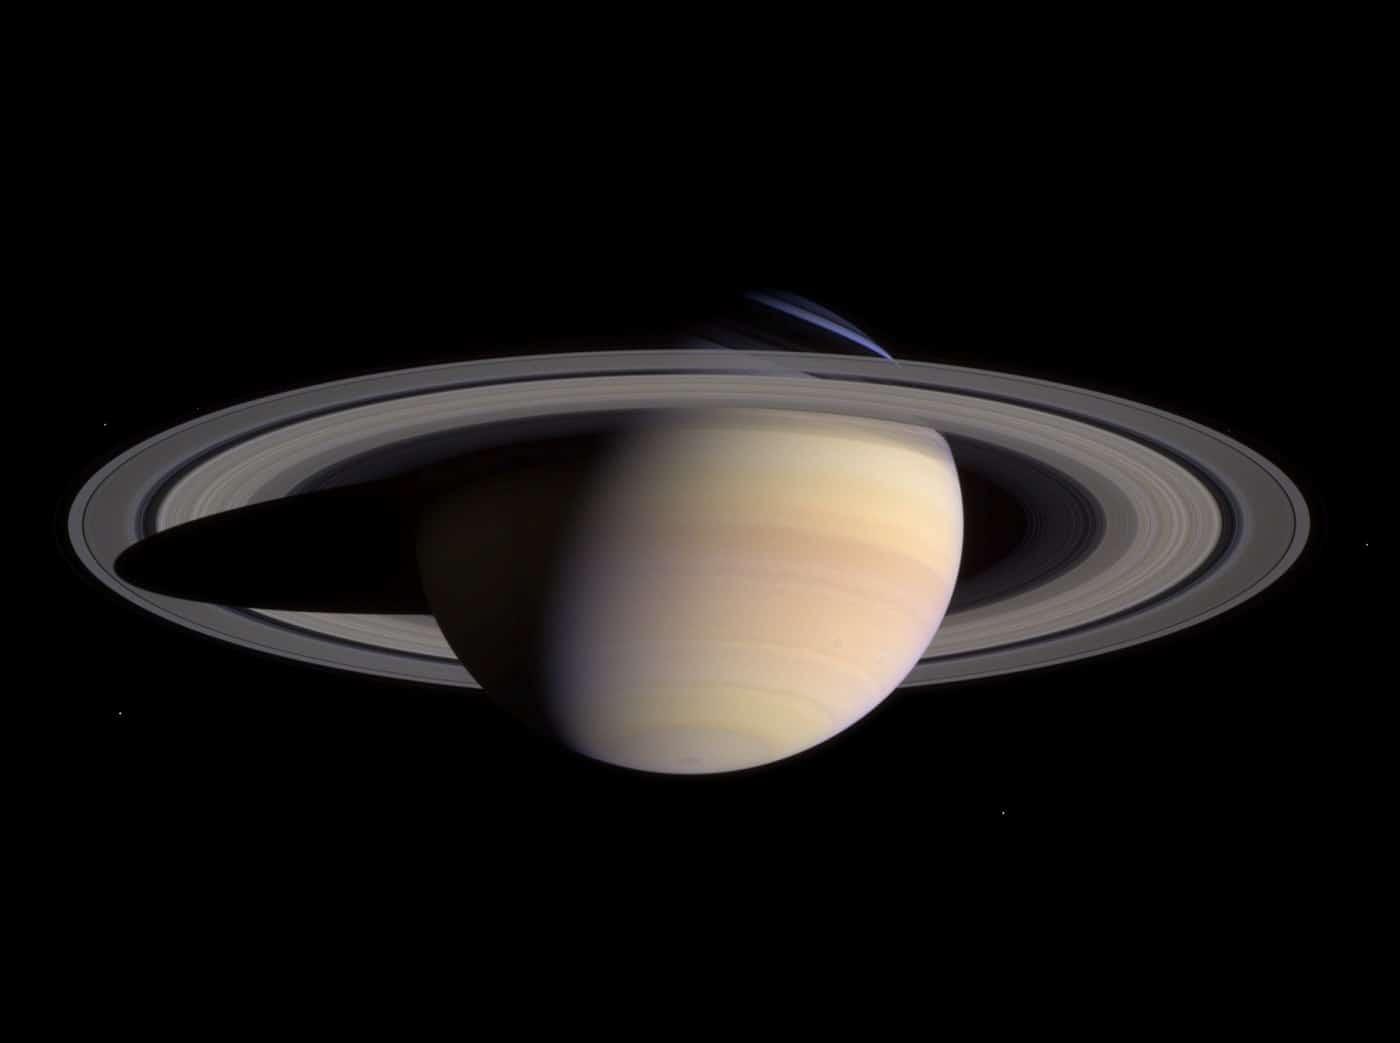 Planetariul Galileo Galilei aduce Universul mai aproape